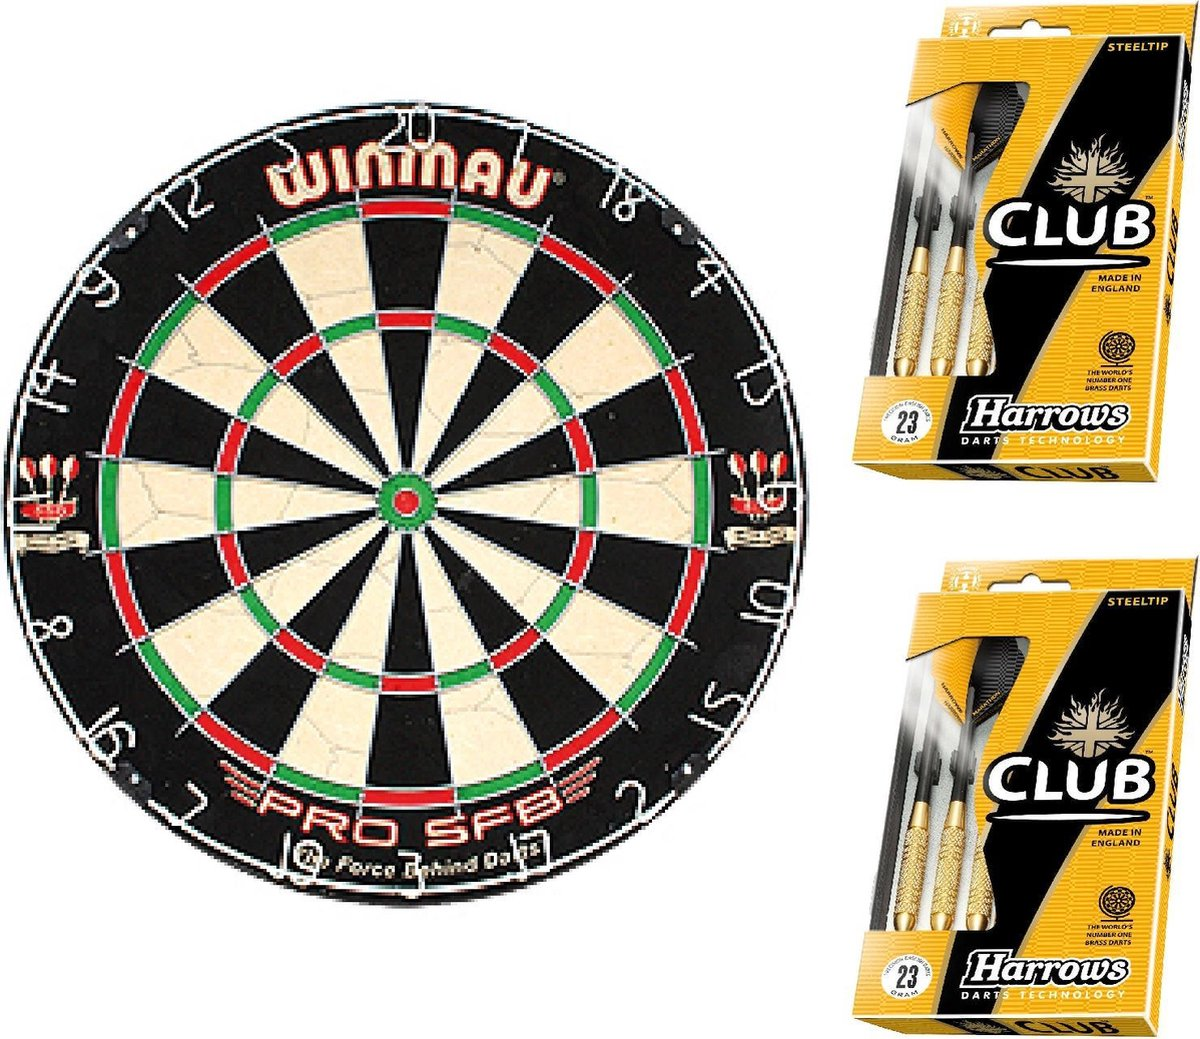 Dragon darts - Green startersset - Winmau pro sfb - dartbord - plus 2 sets Harrows - dartpijlen